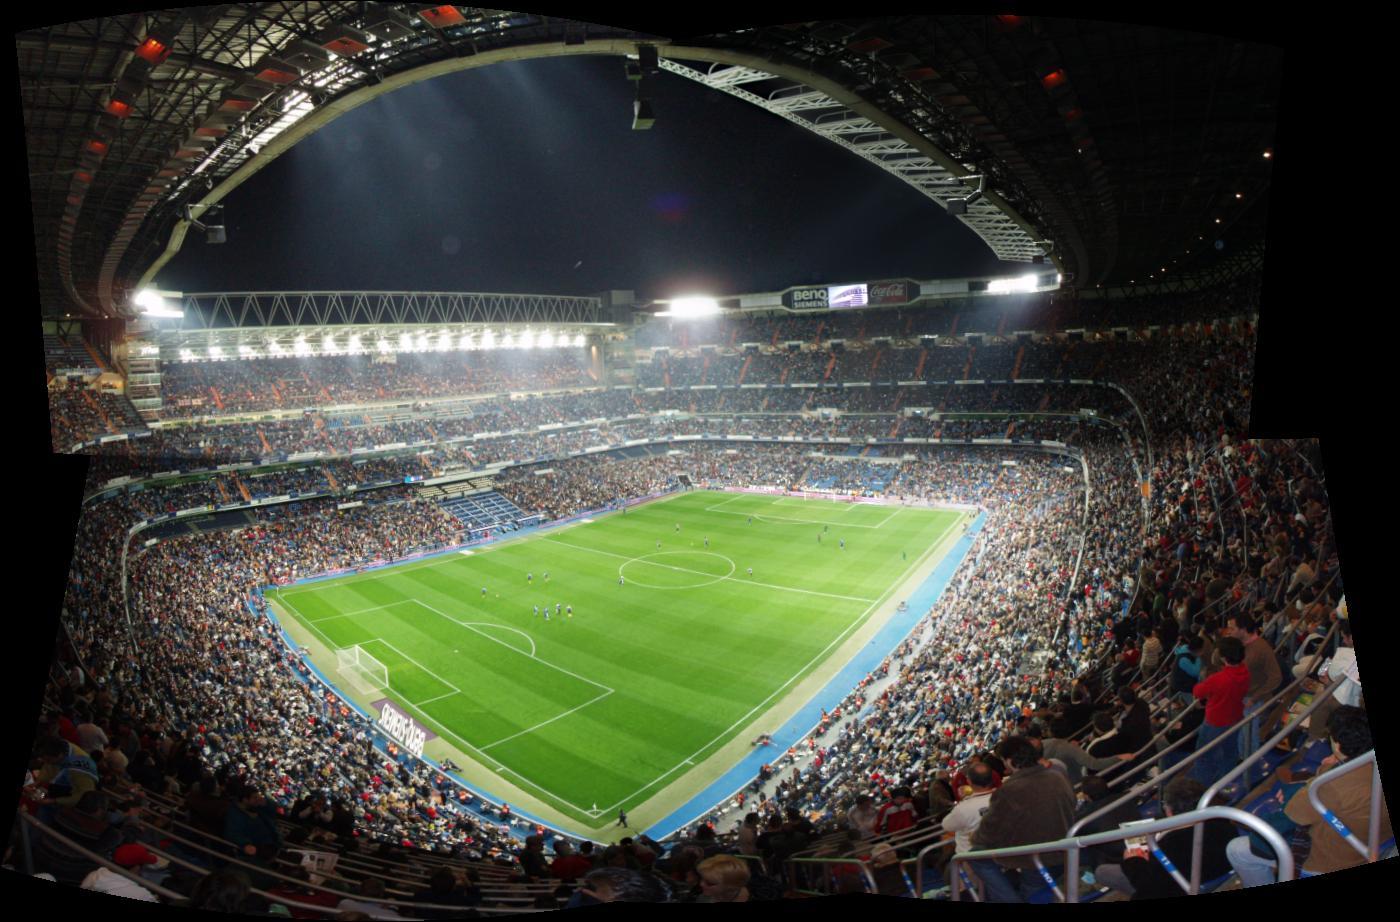 Fichier:panoramica 002 - estadio santiago bernabeu